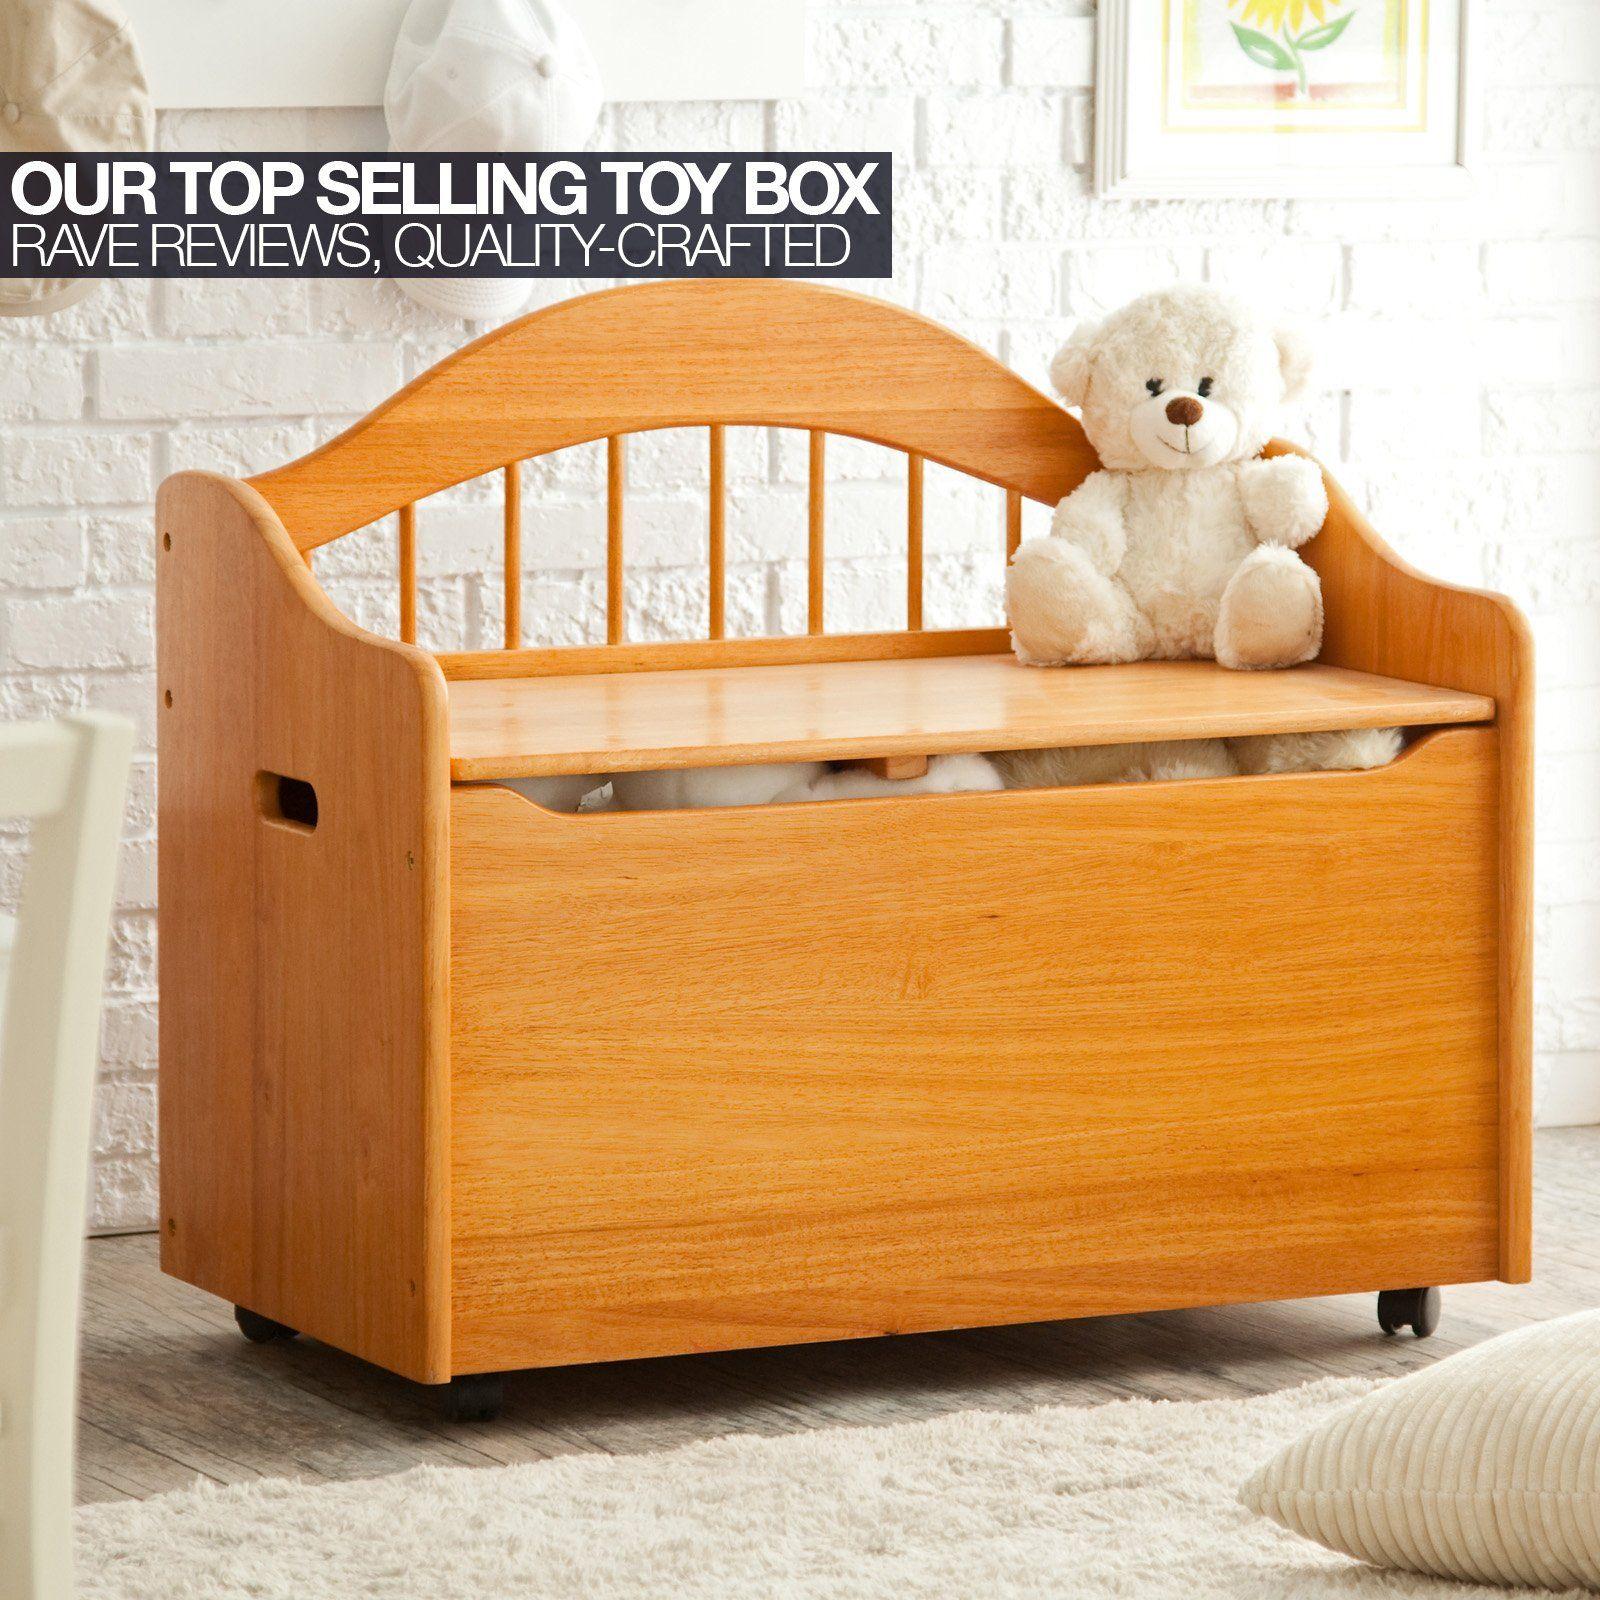 Wildkin Cherry Finish Toy Box Bench LOD33055